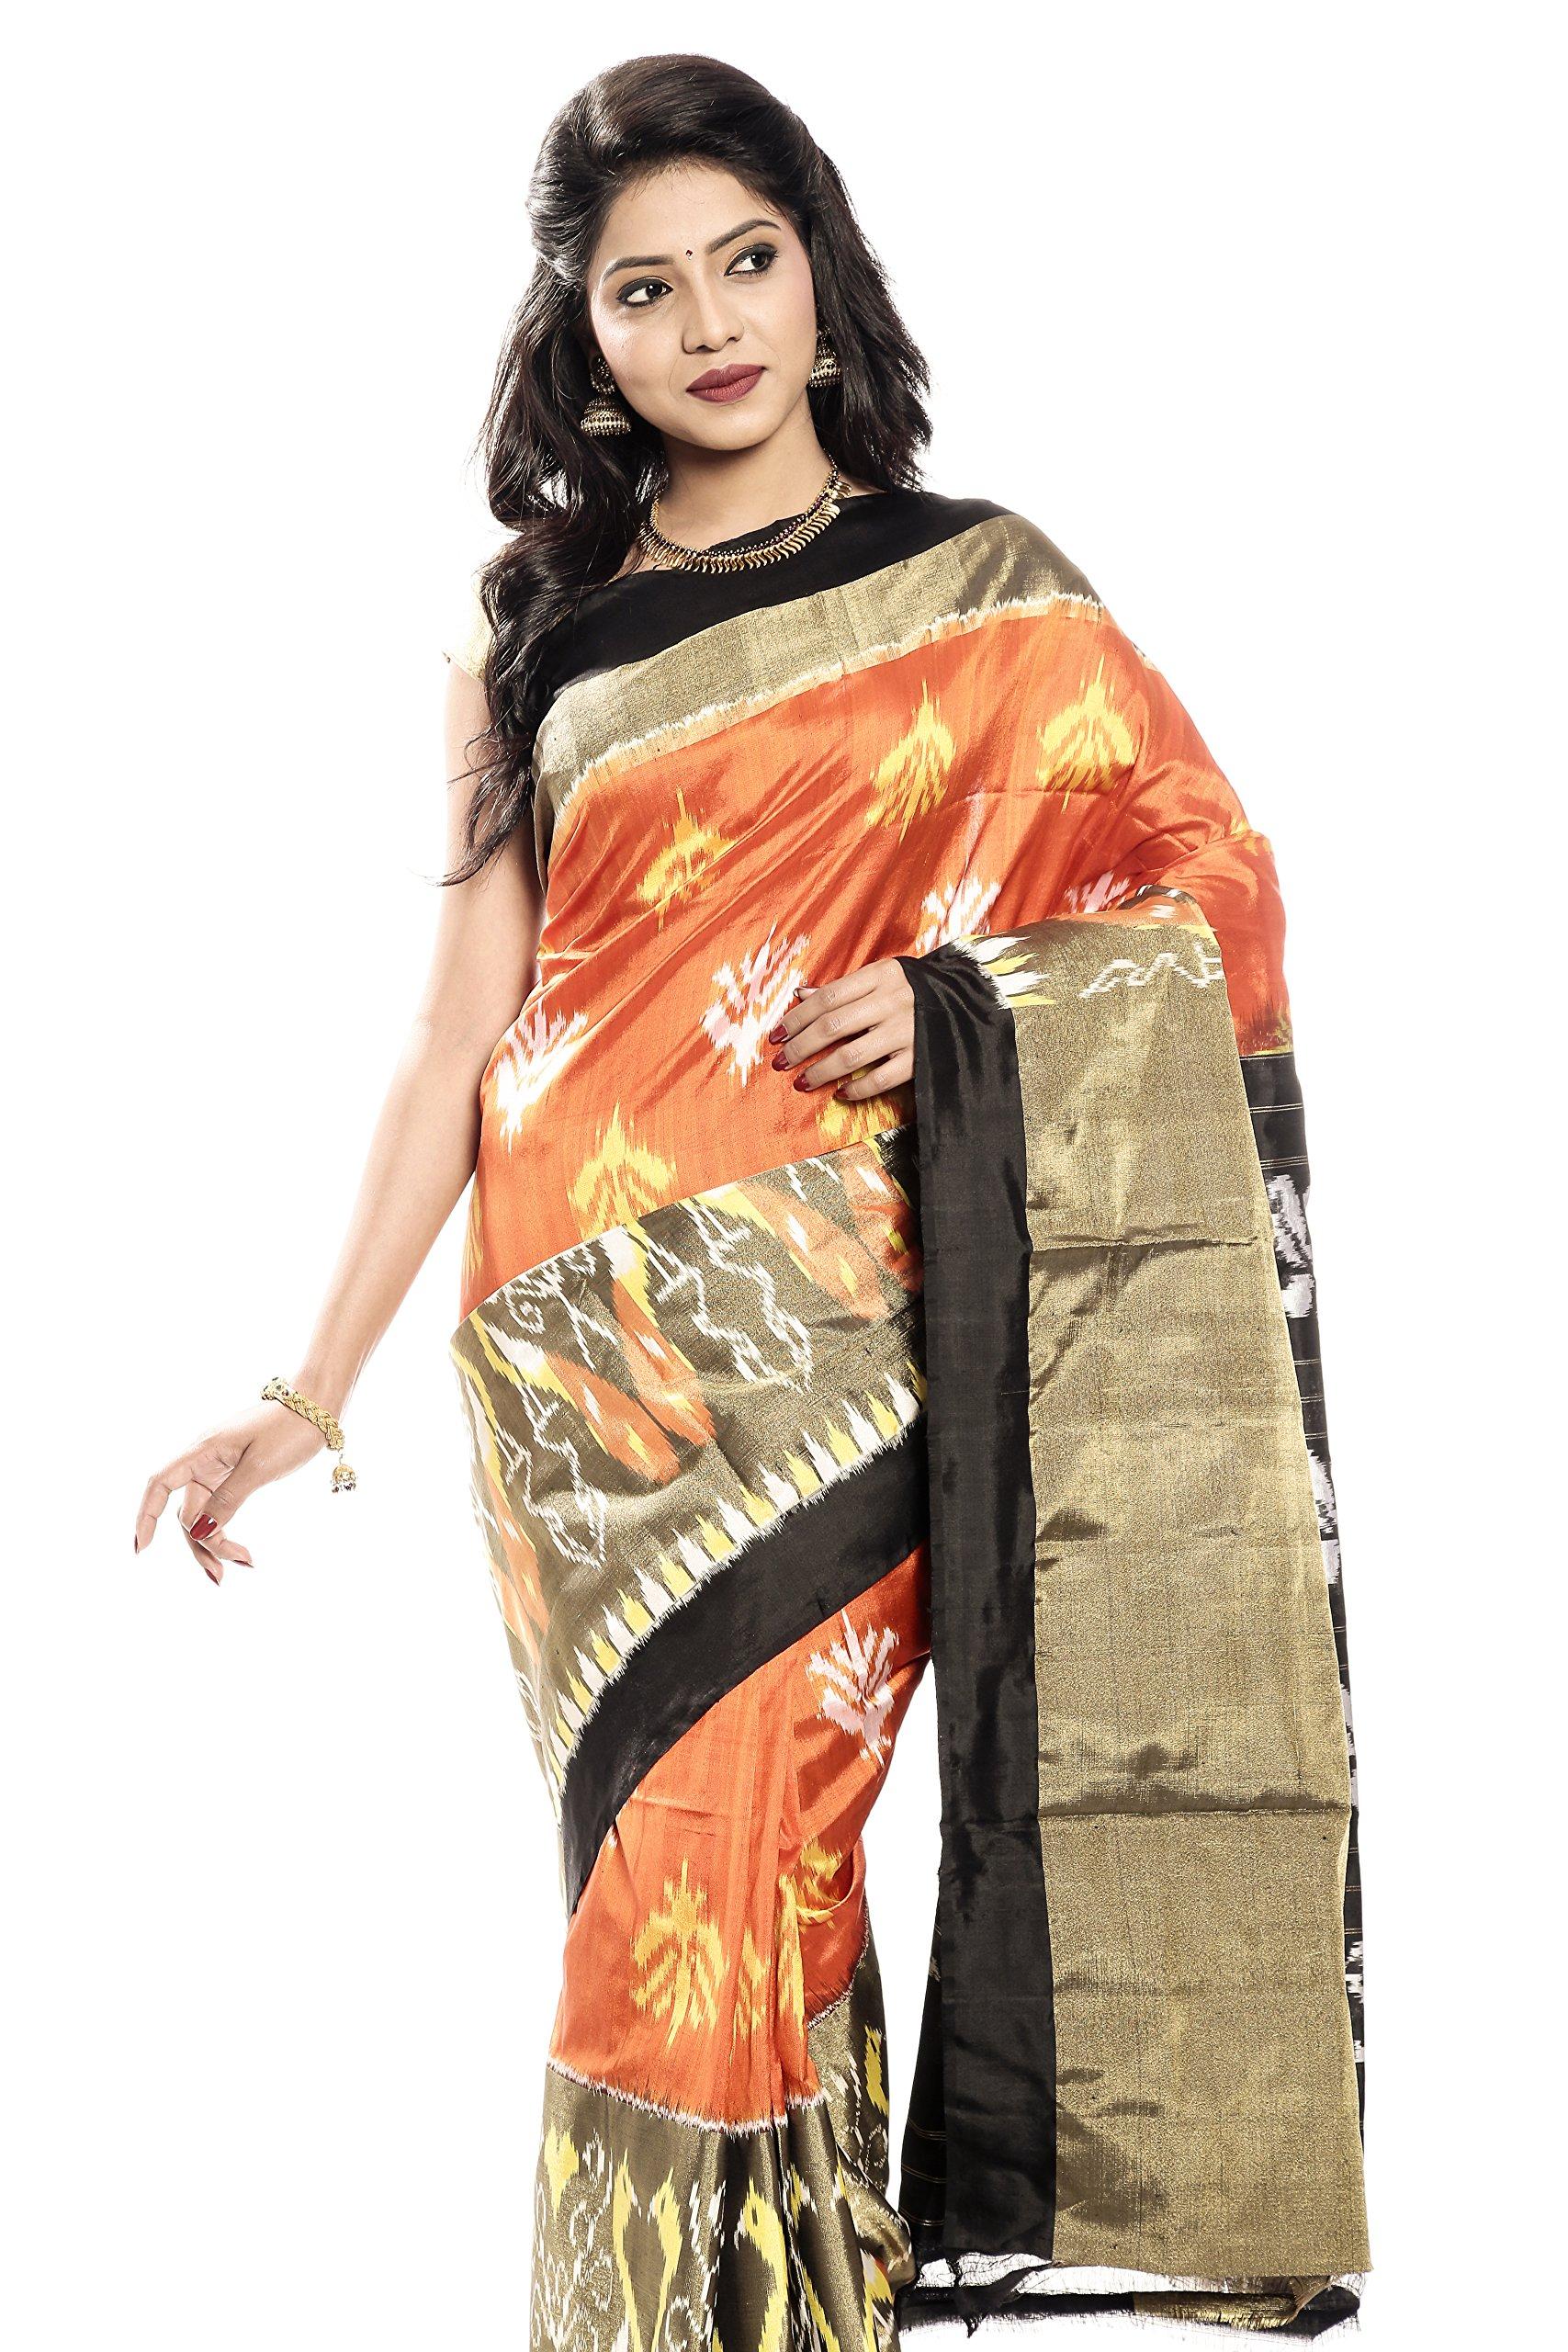 Mandakini — Indian Women's Pochampally - Handloom - Ikat Pure Silk Saree (Orange-Black ) (MK320)